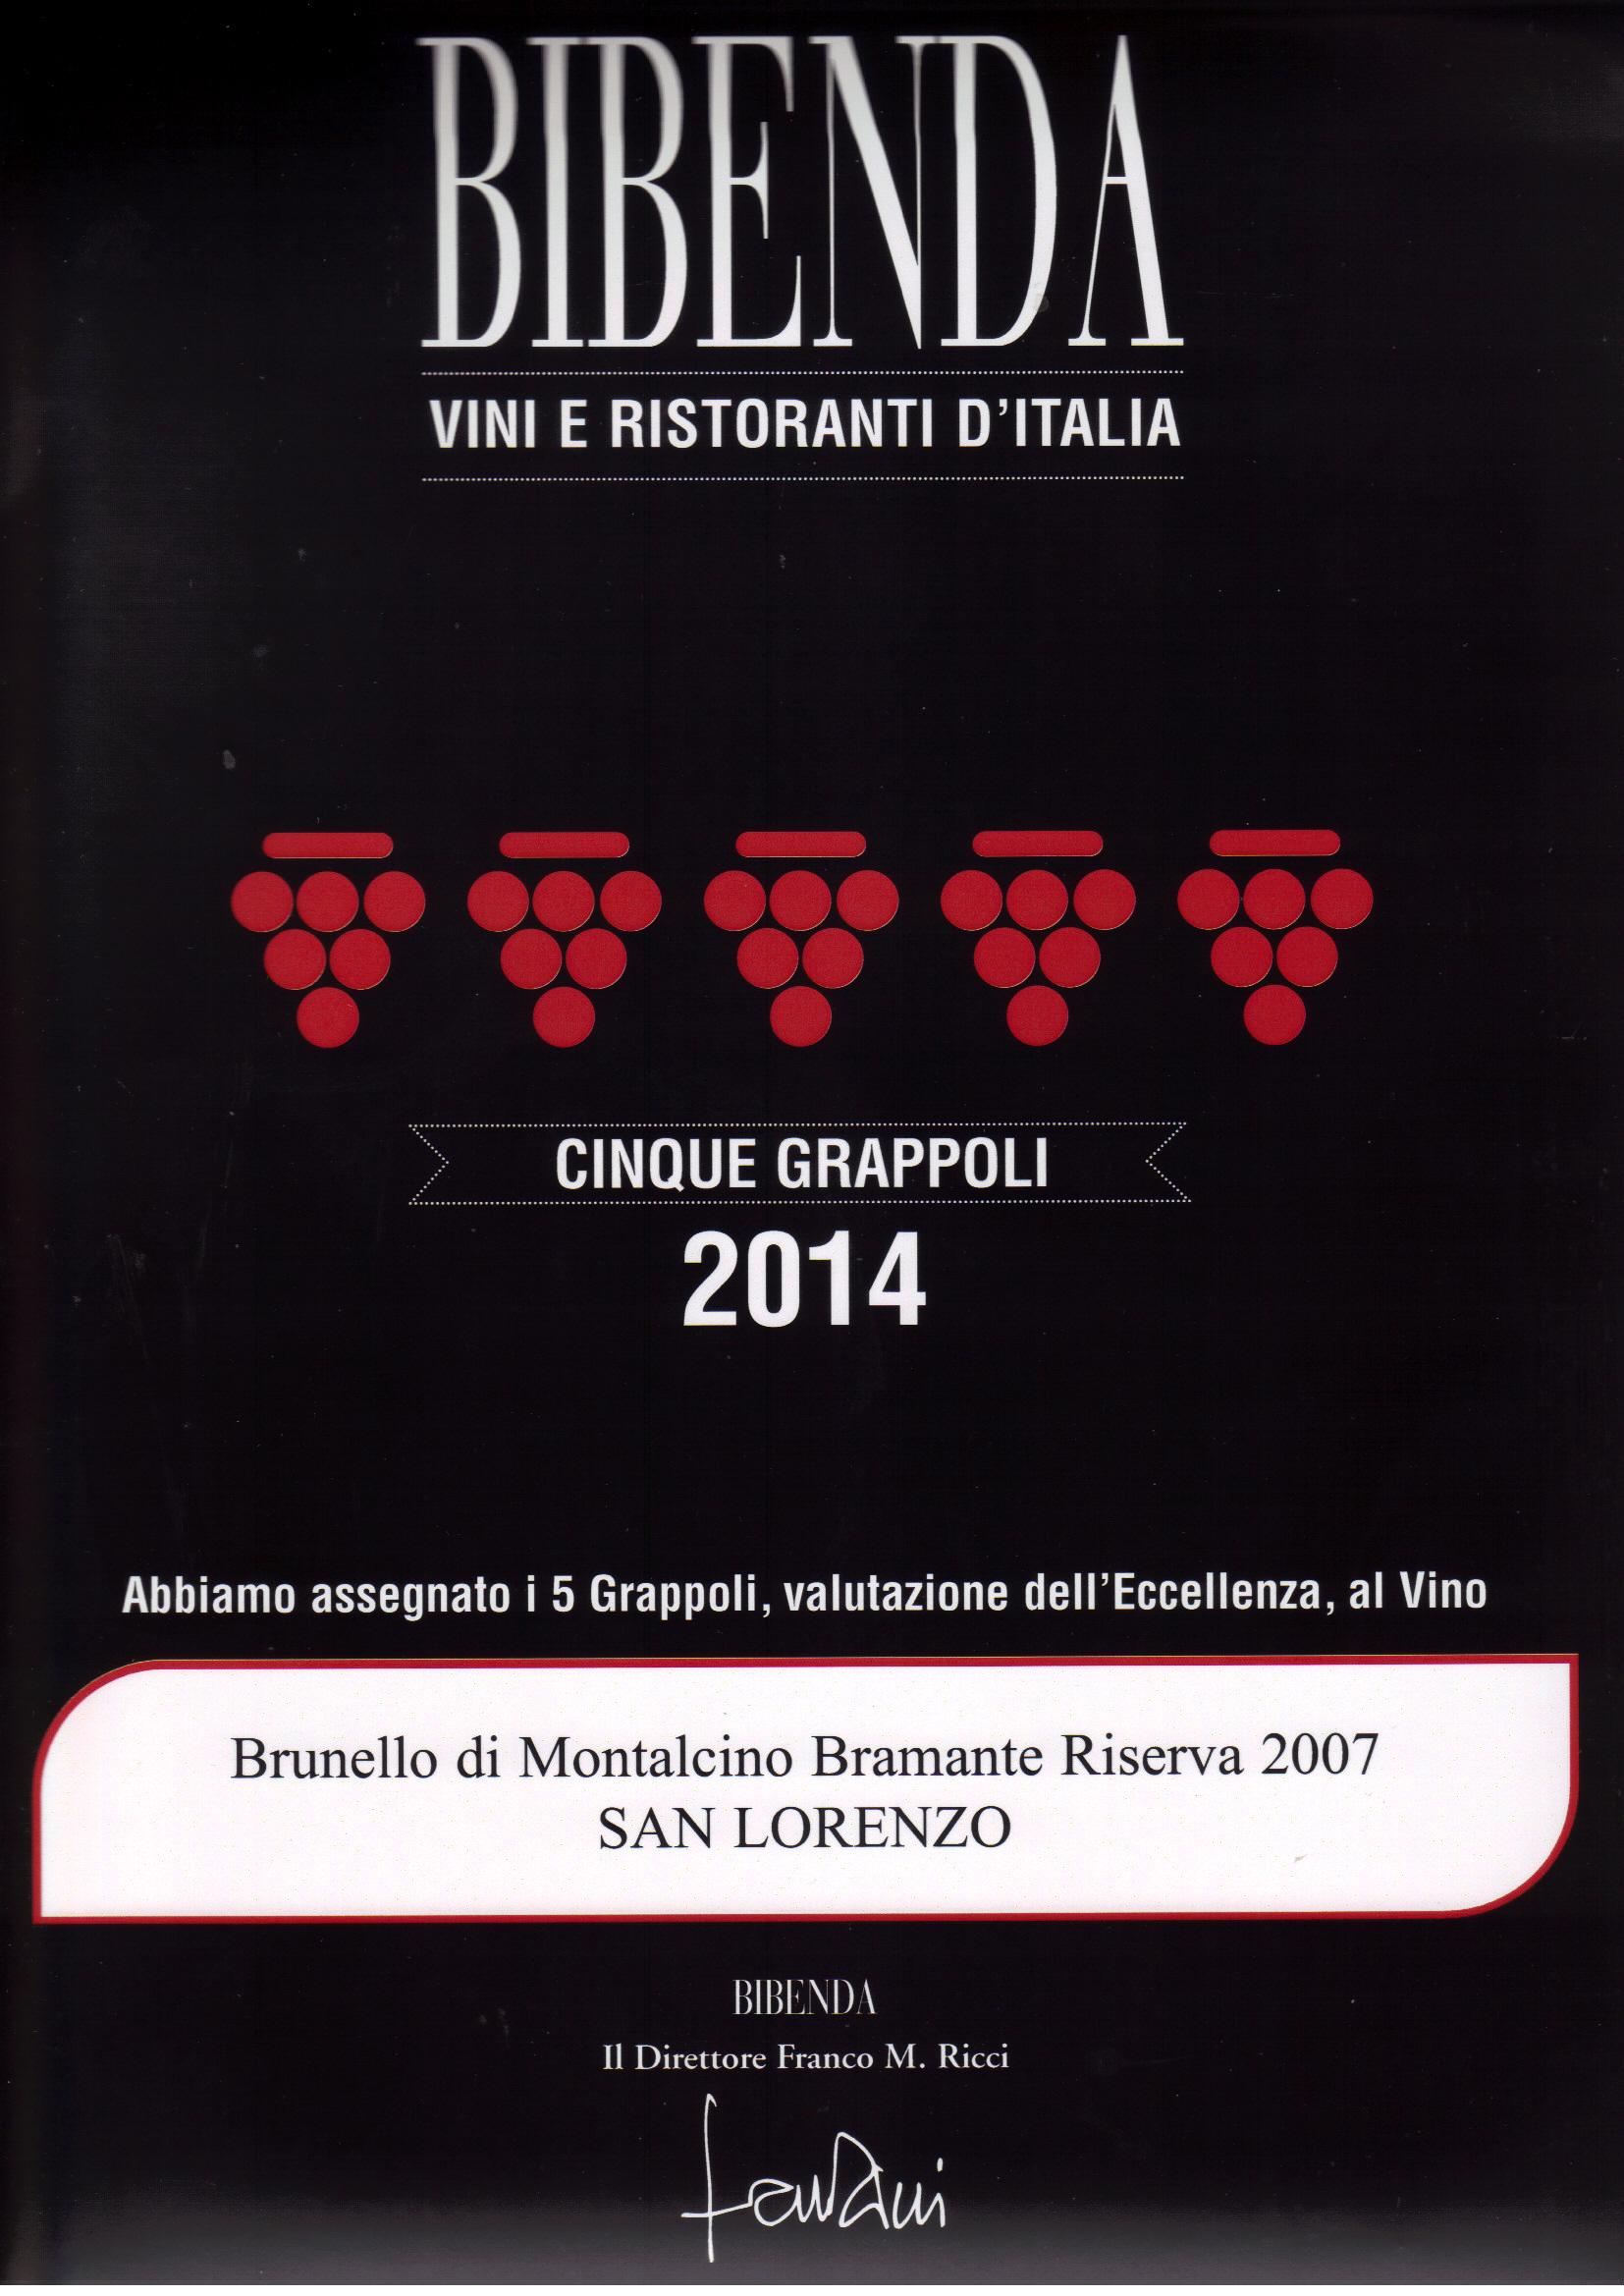 Bibenda 2014 5 grappoli riserva 2007